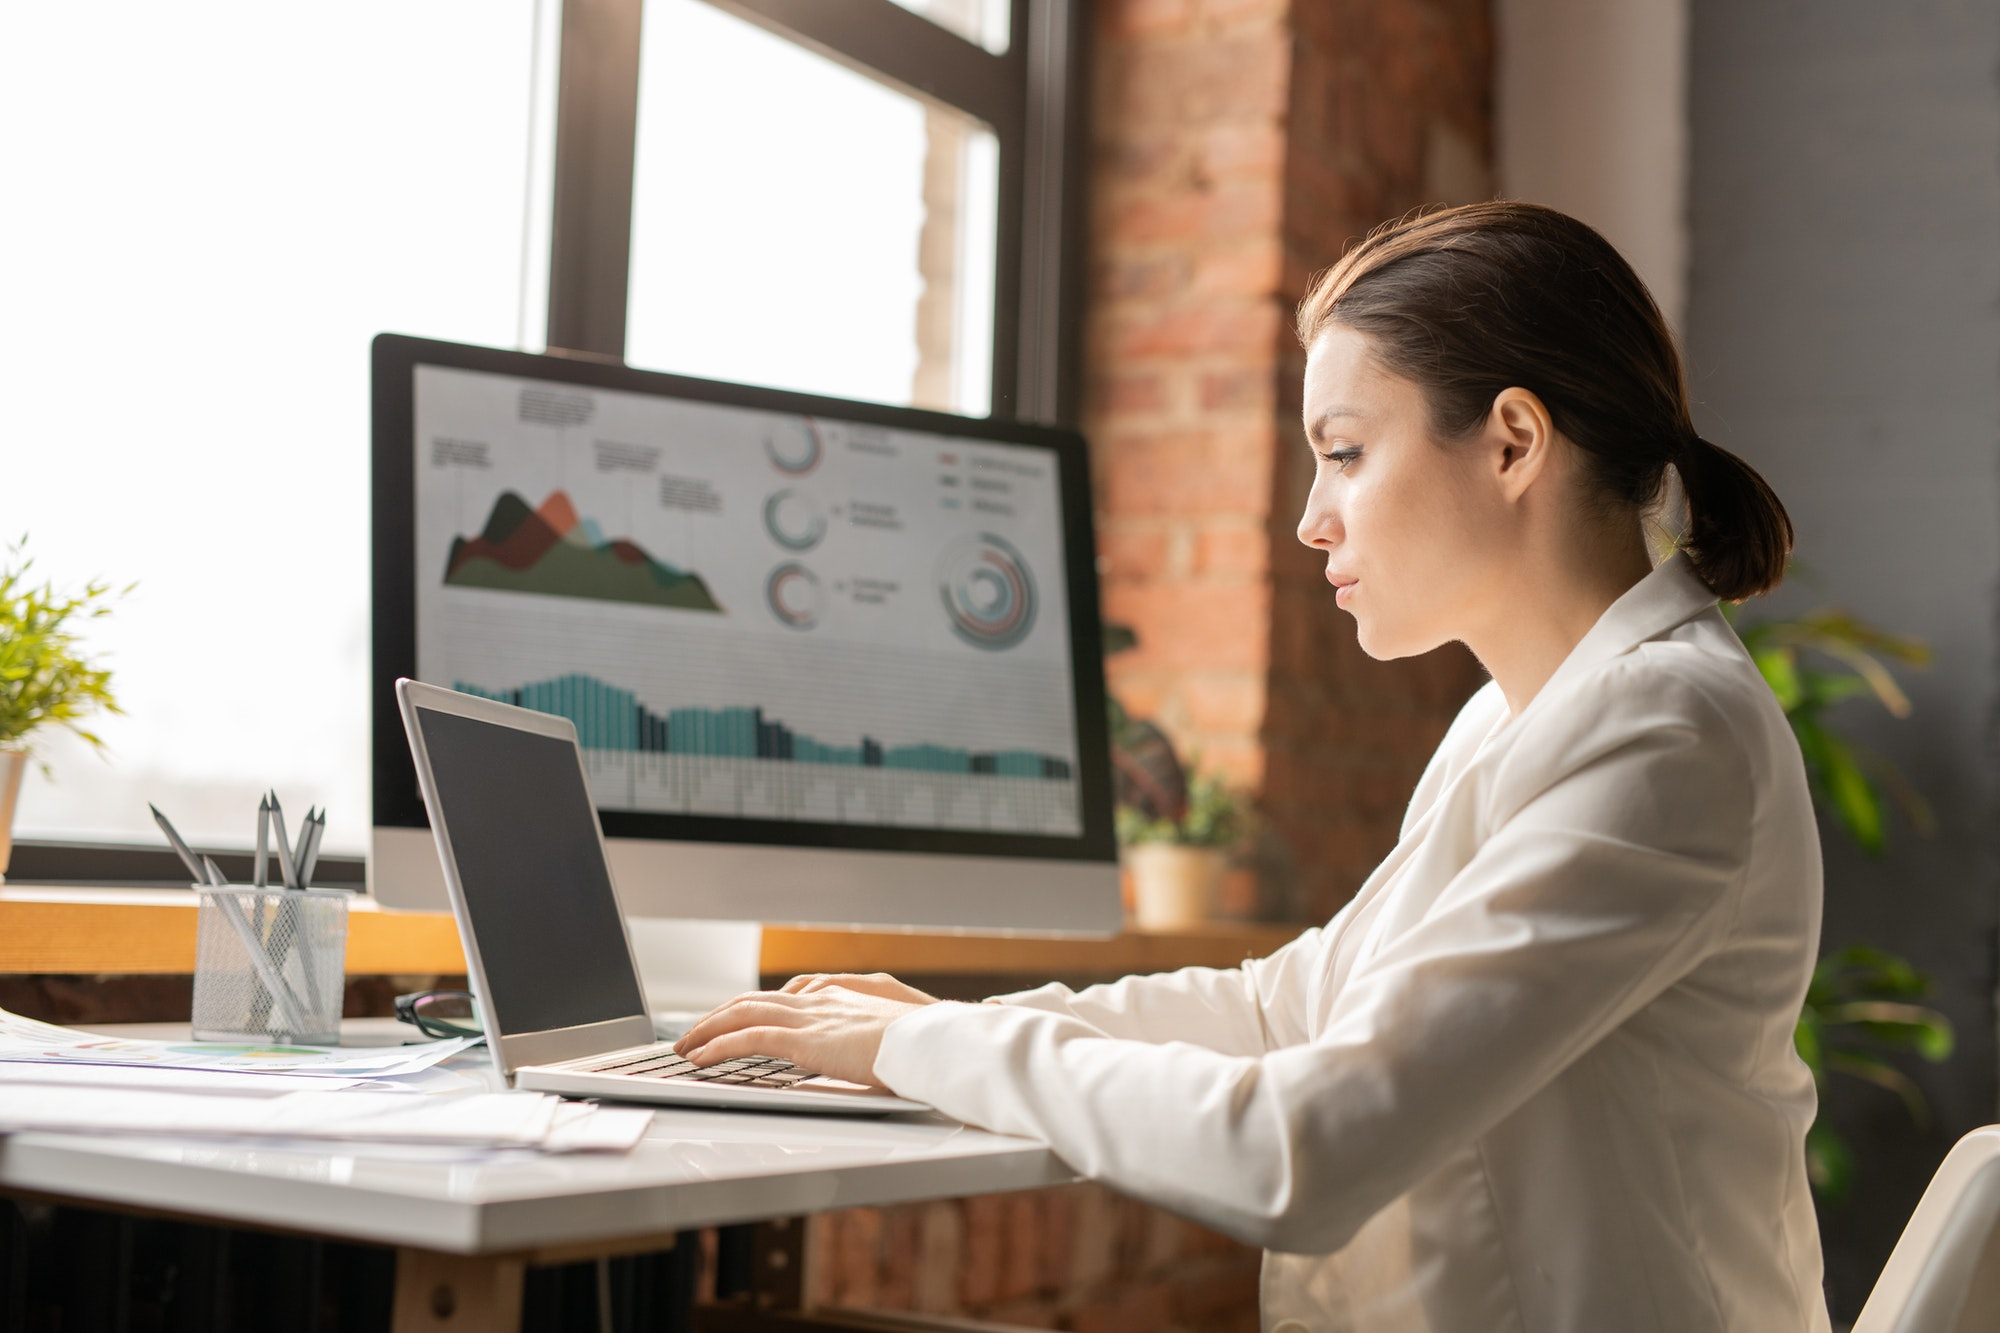 Analyzing online data